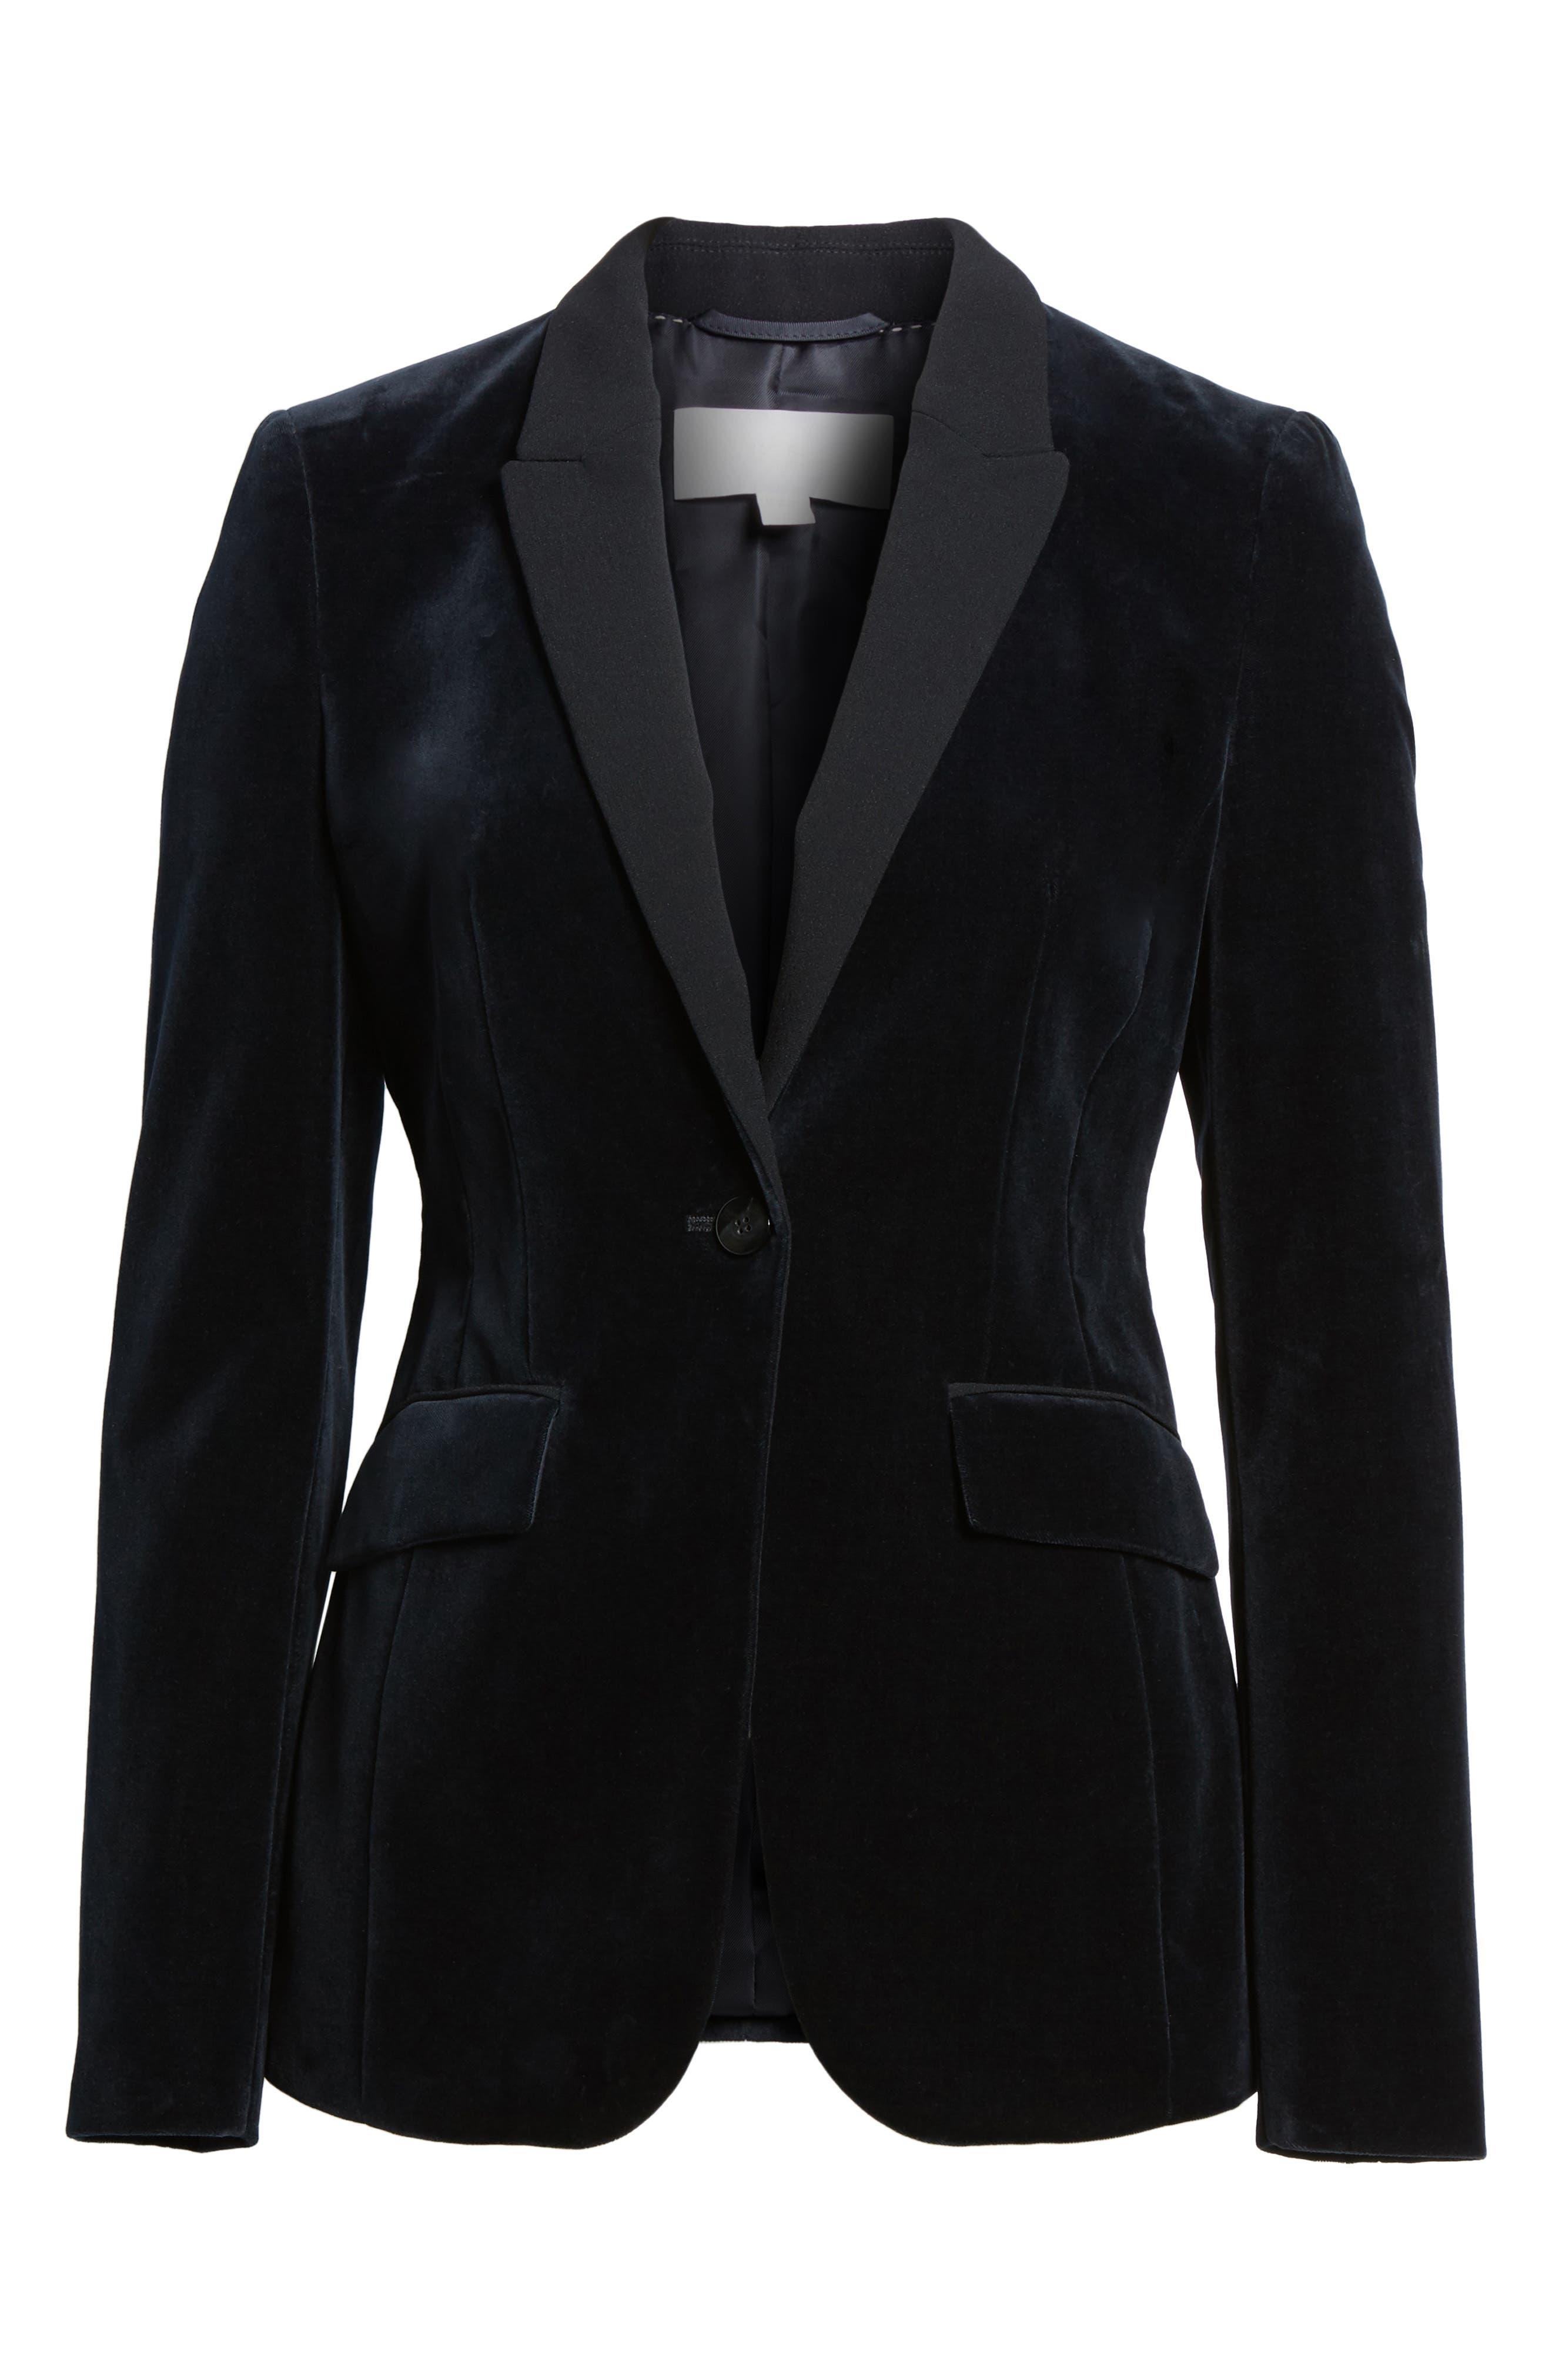 Jeronala Velvet Tuxedo Jacket,                             Alternate thumbnail 5, color,                             480